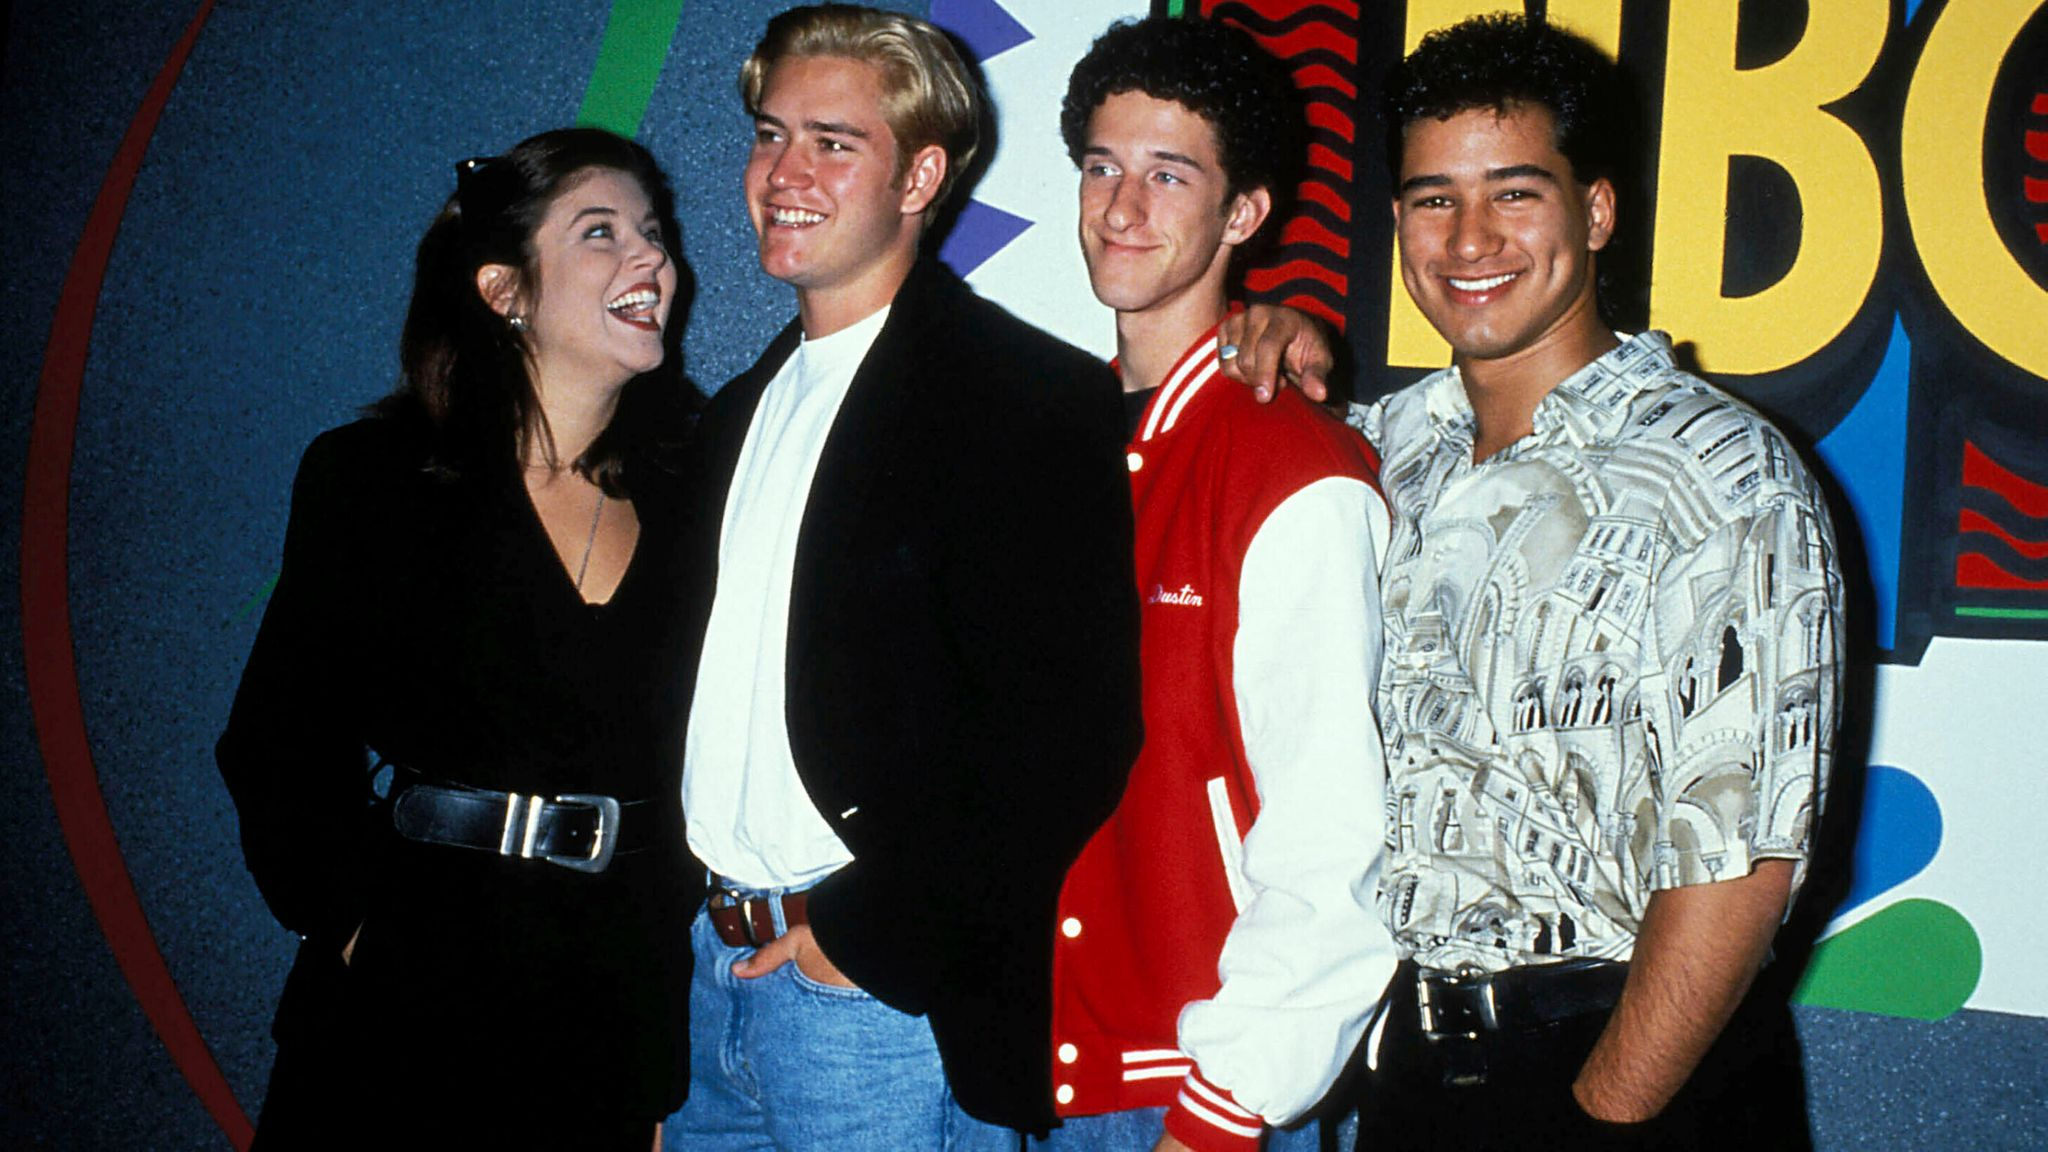 Tiffani Amber Thiessen, Mark Paul Gosselaar, Dustin Diamond And Mario Lopez. 1996 Credit: 3313017Globe Photos/MediaPunch /IPX